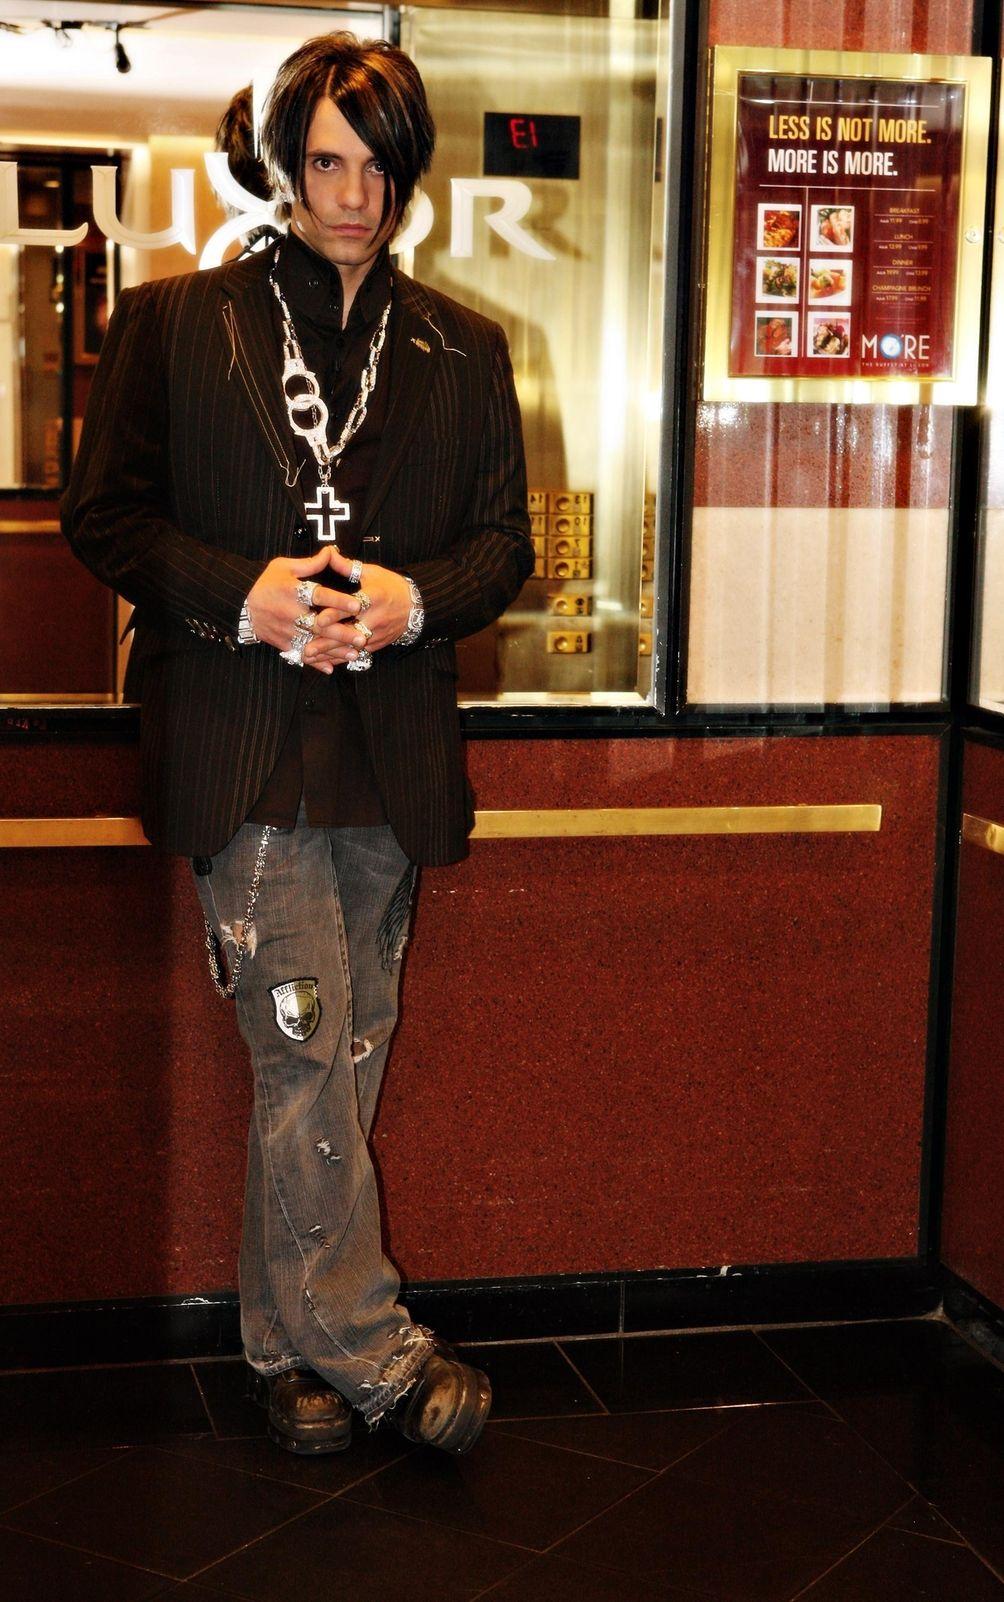 Illusionist Criss Angel, star of